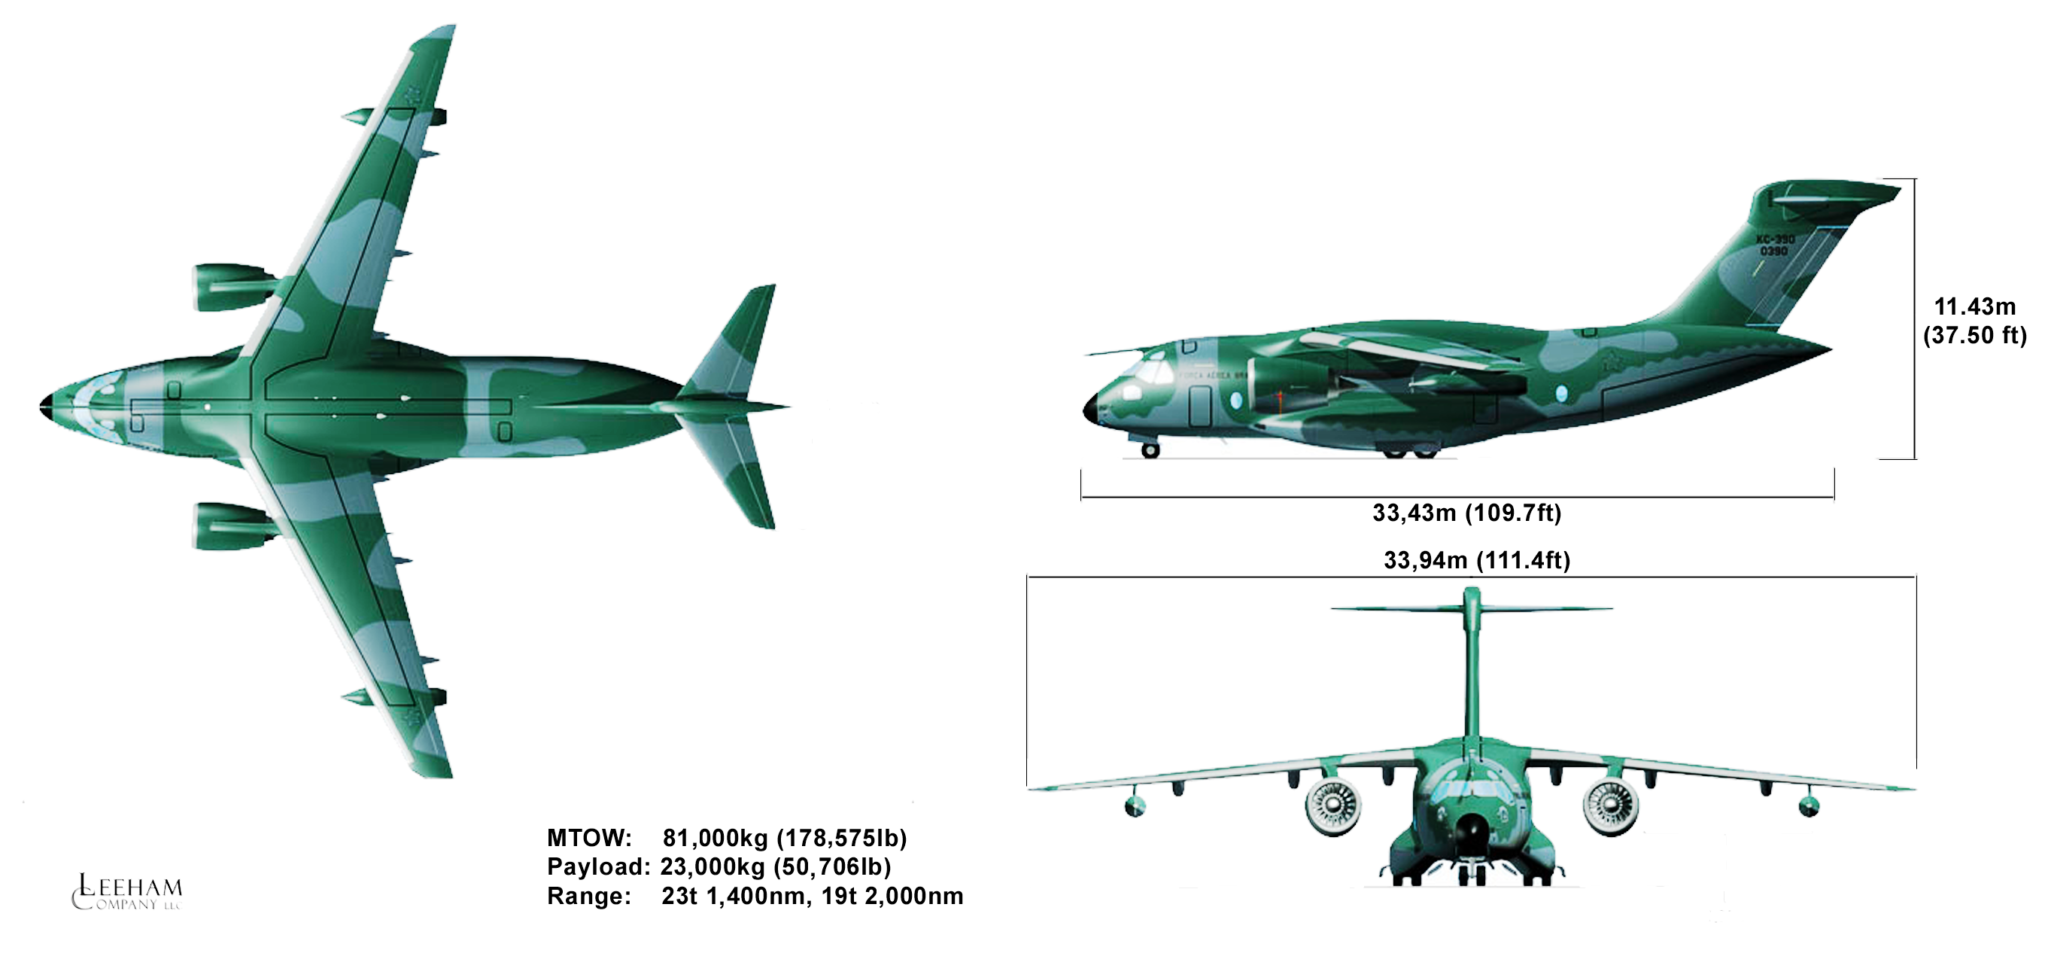 KC-390 3D view with main data. Source: Leeham Co